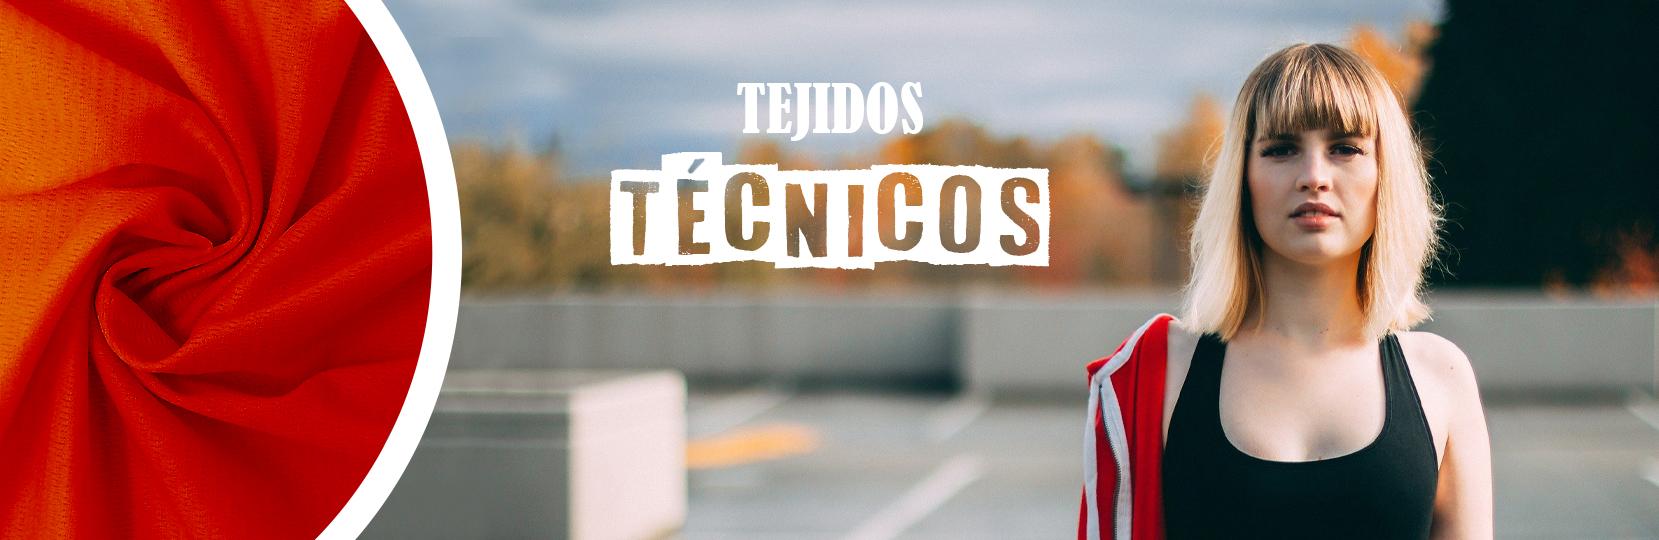 TEJIDOS TÉCNICOS